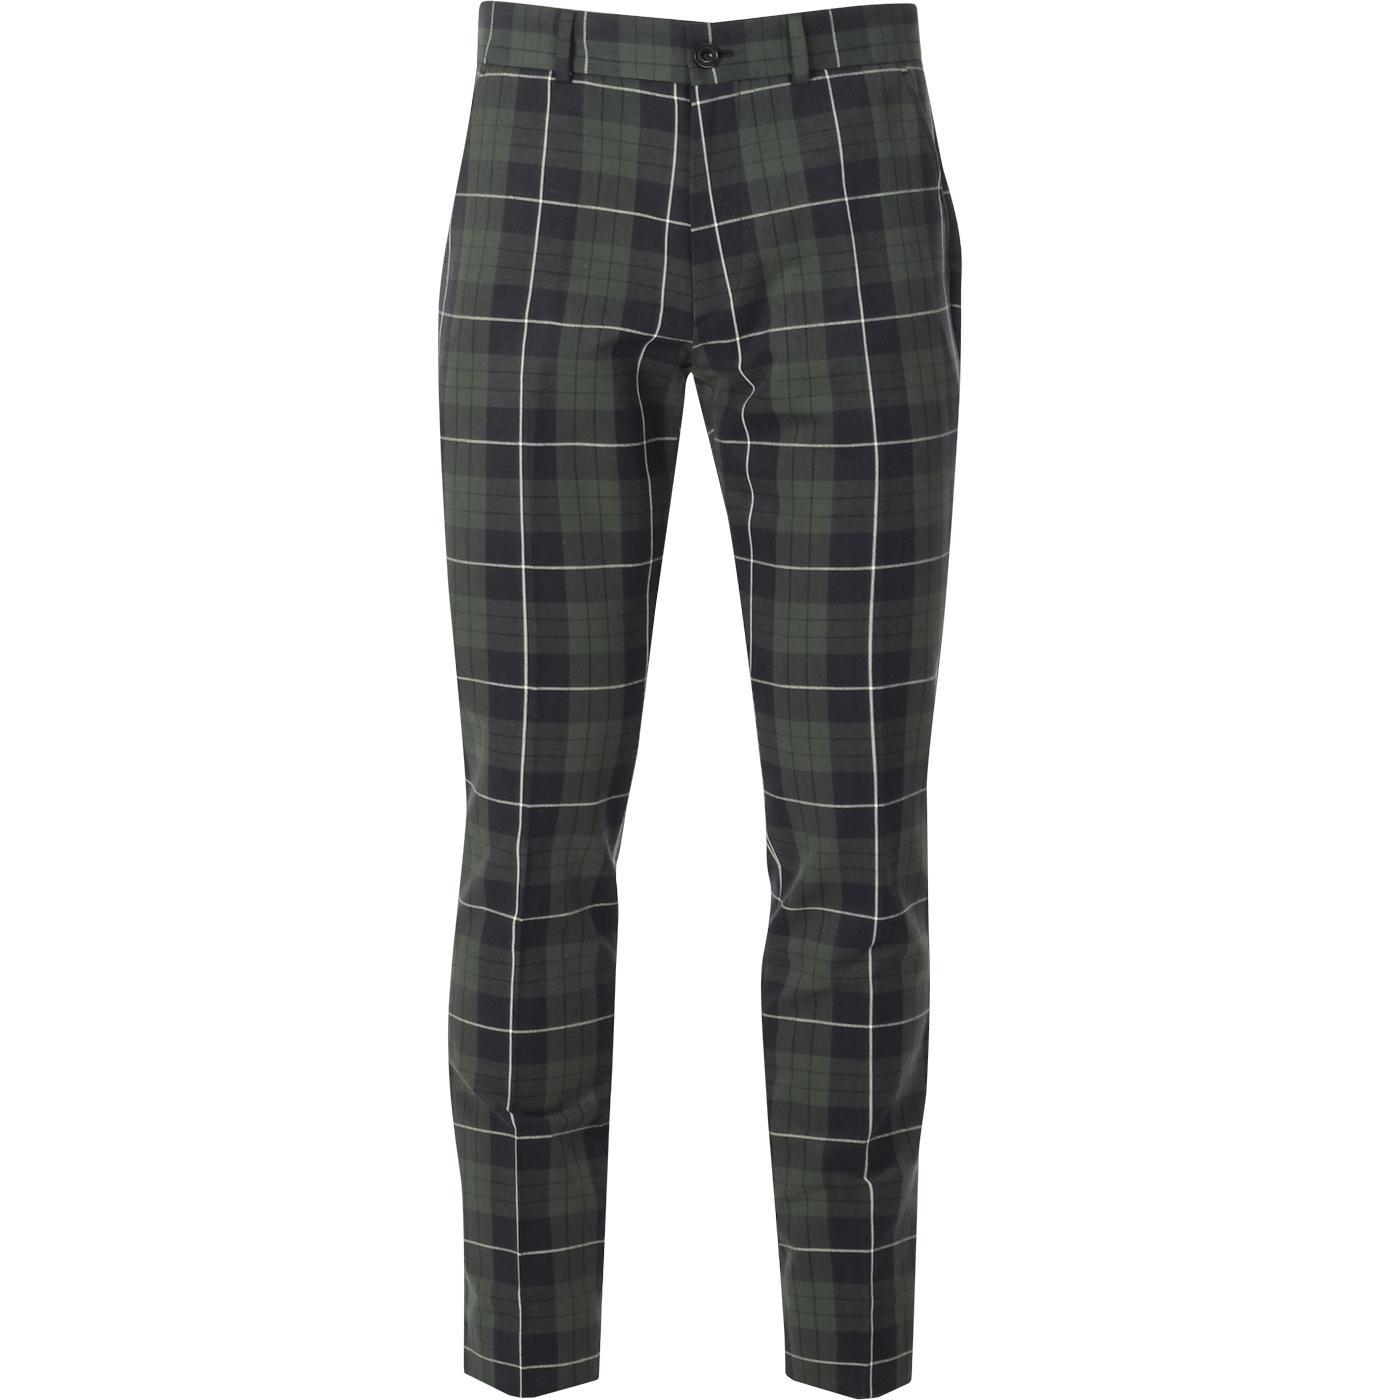 Elm FARAH 100 Mod 60s Tartan Check Trousers (Yale)